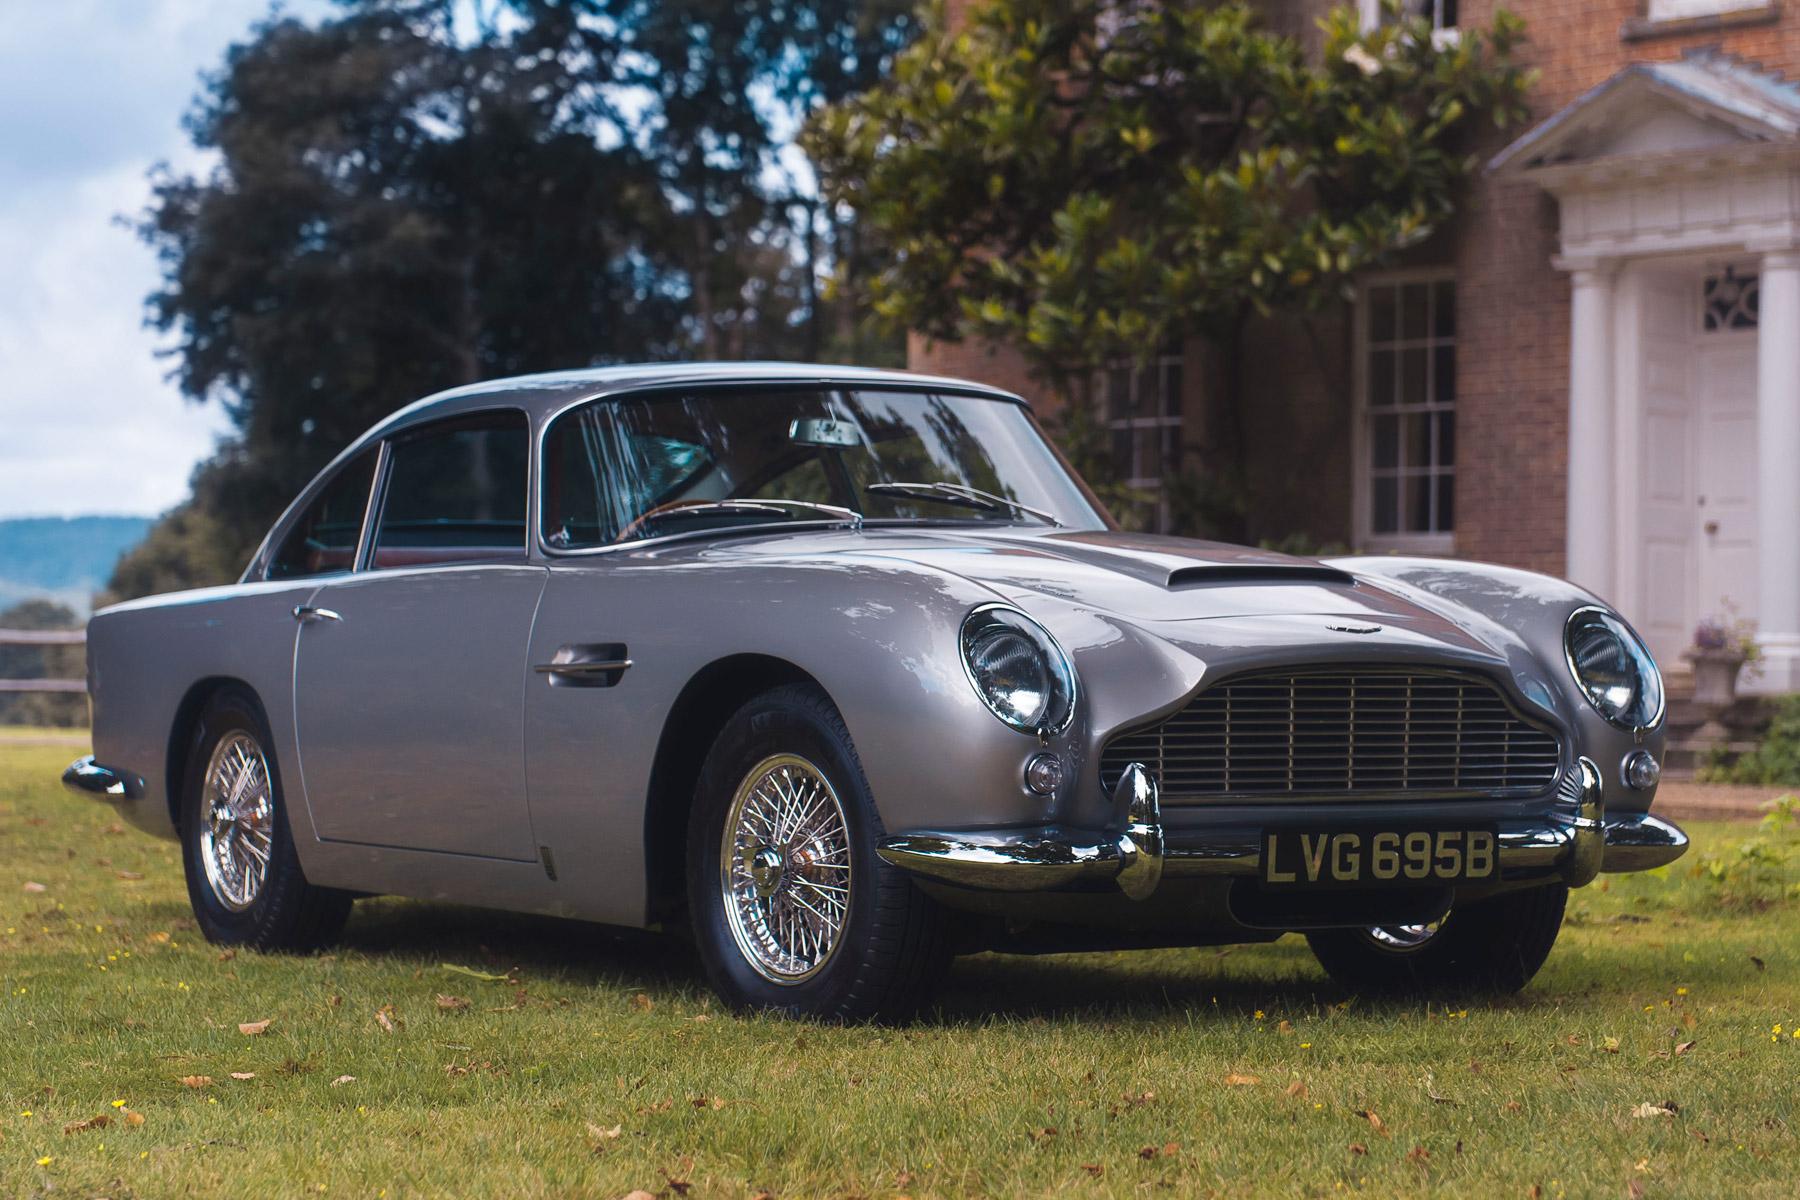 Man buys £825,000 Aston Martin on his phone